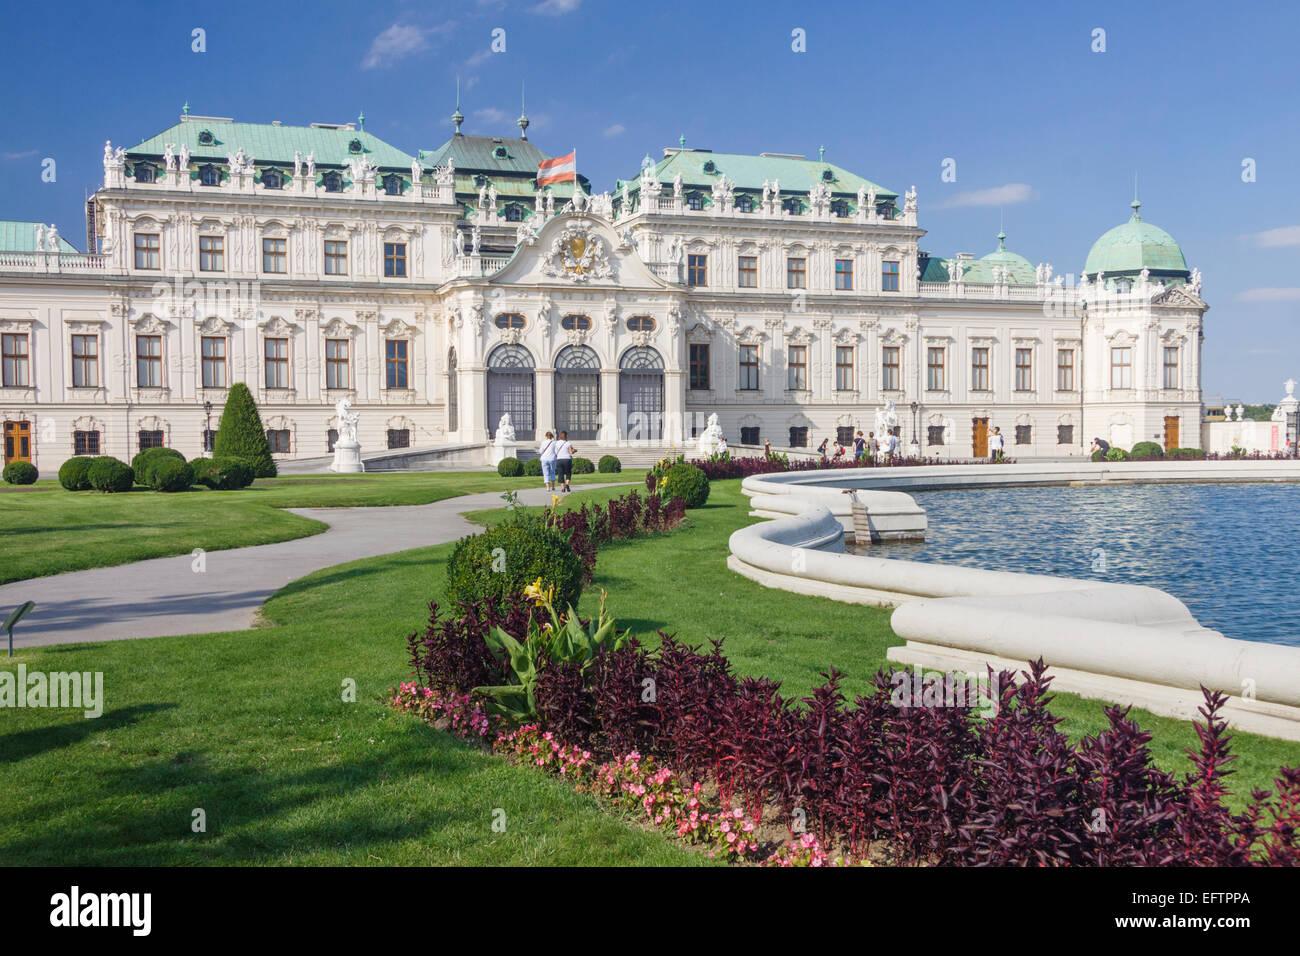 Baroque Upper Belvedere palace. Vienna, Austria - Stock Image